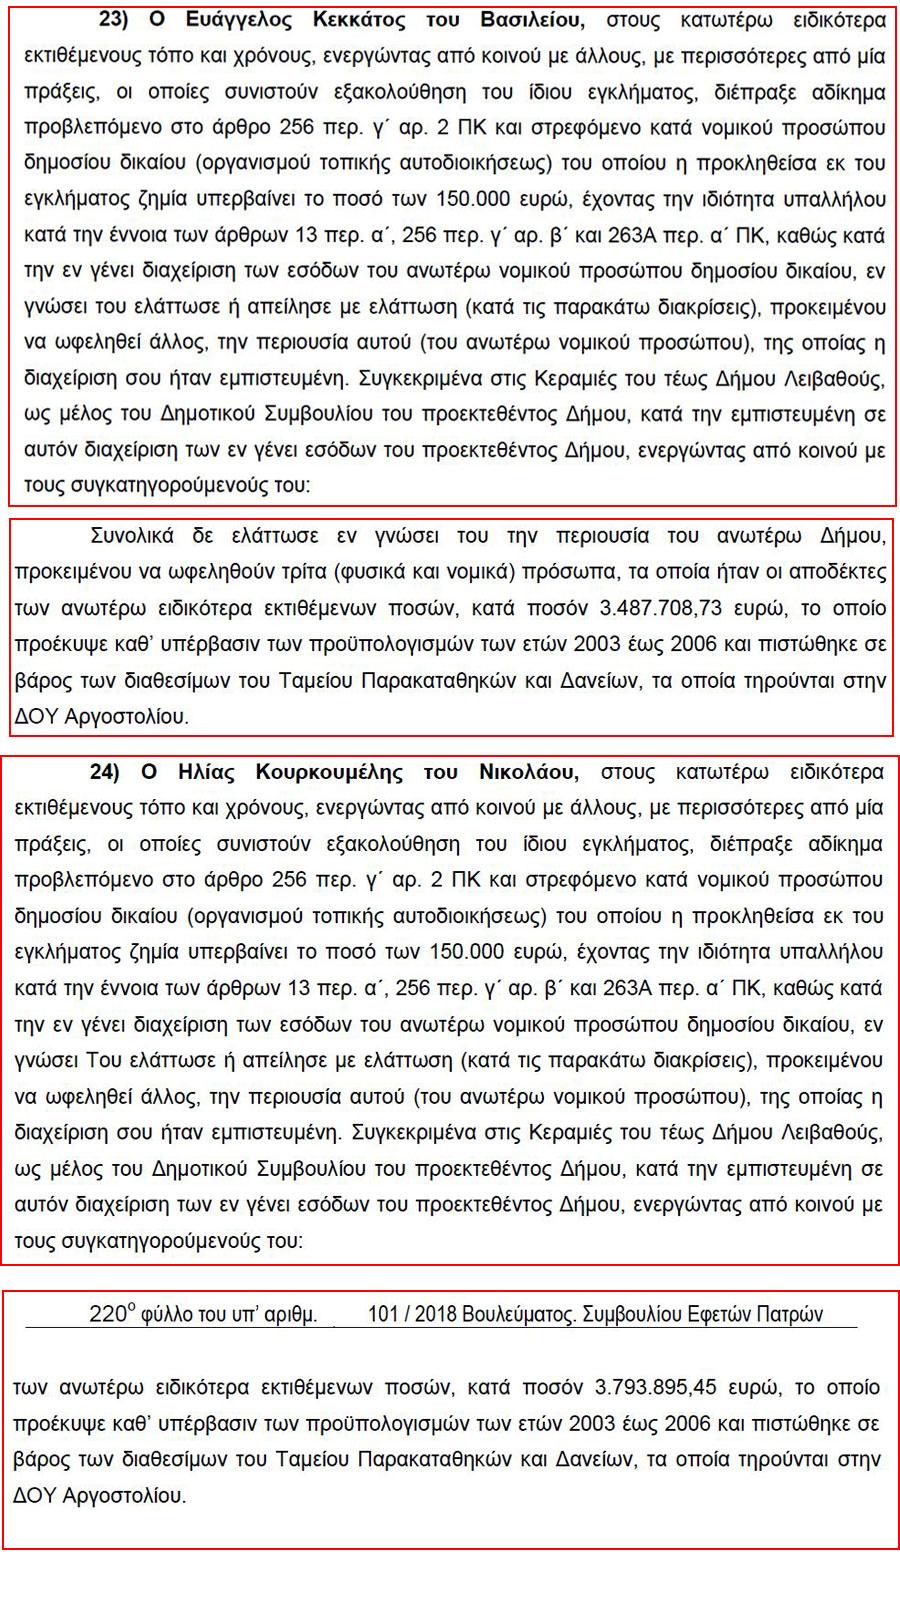 KEKATOS KOURKOYMELHS